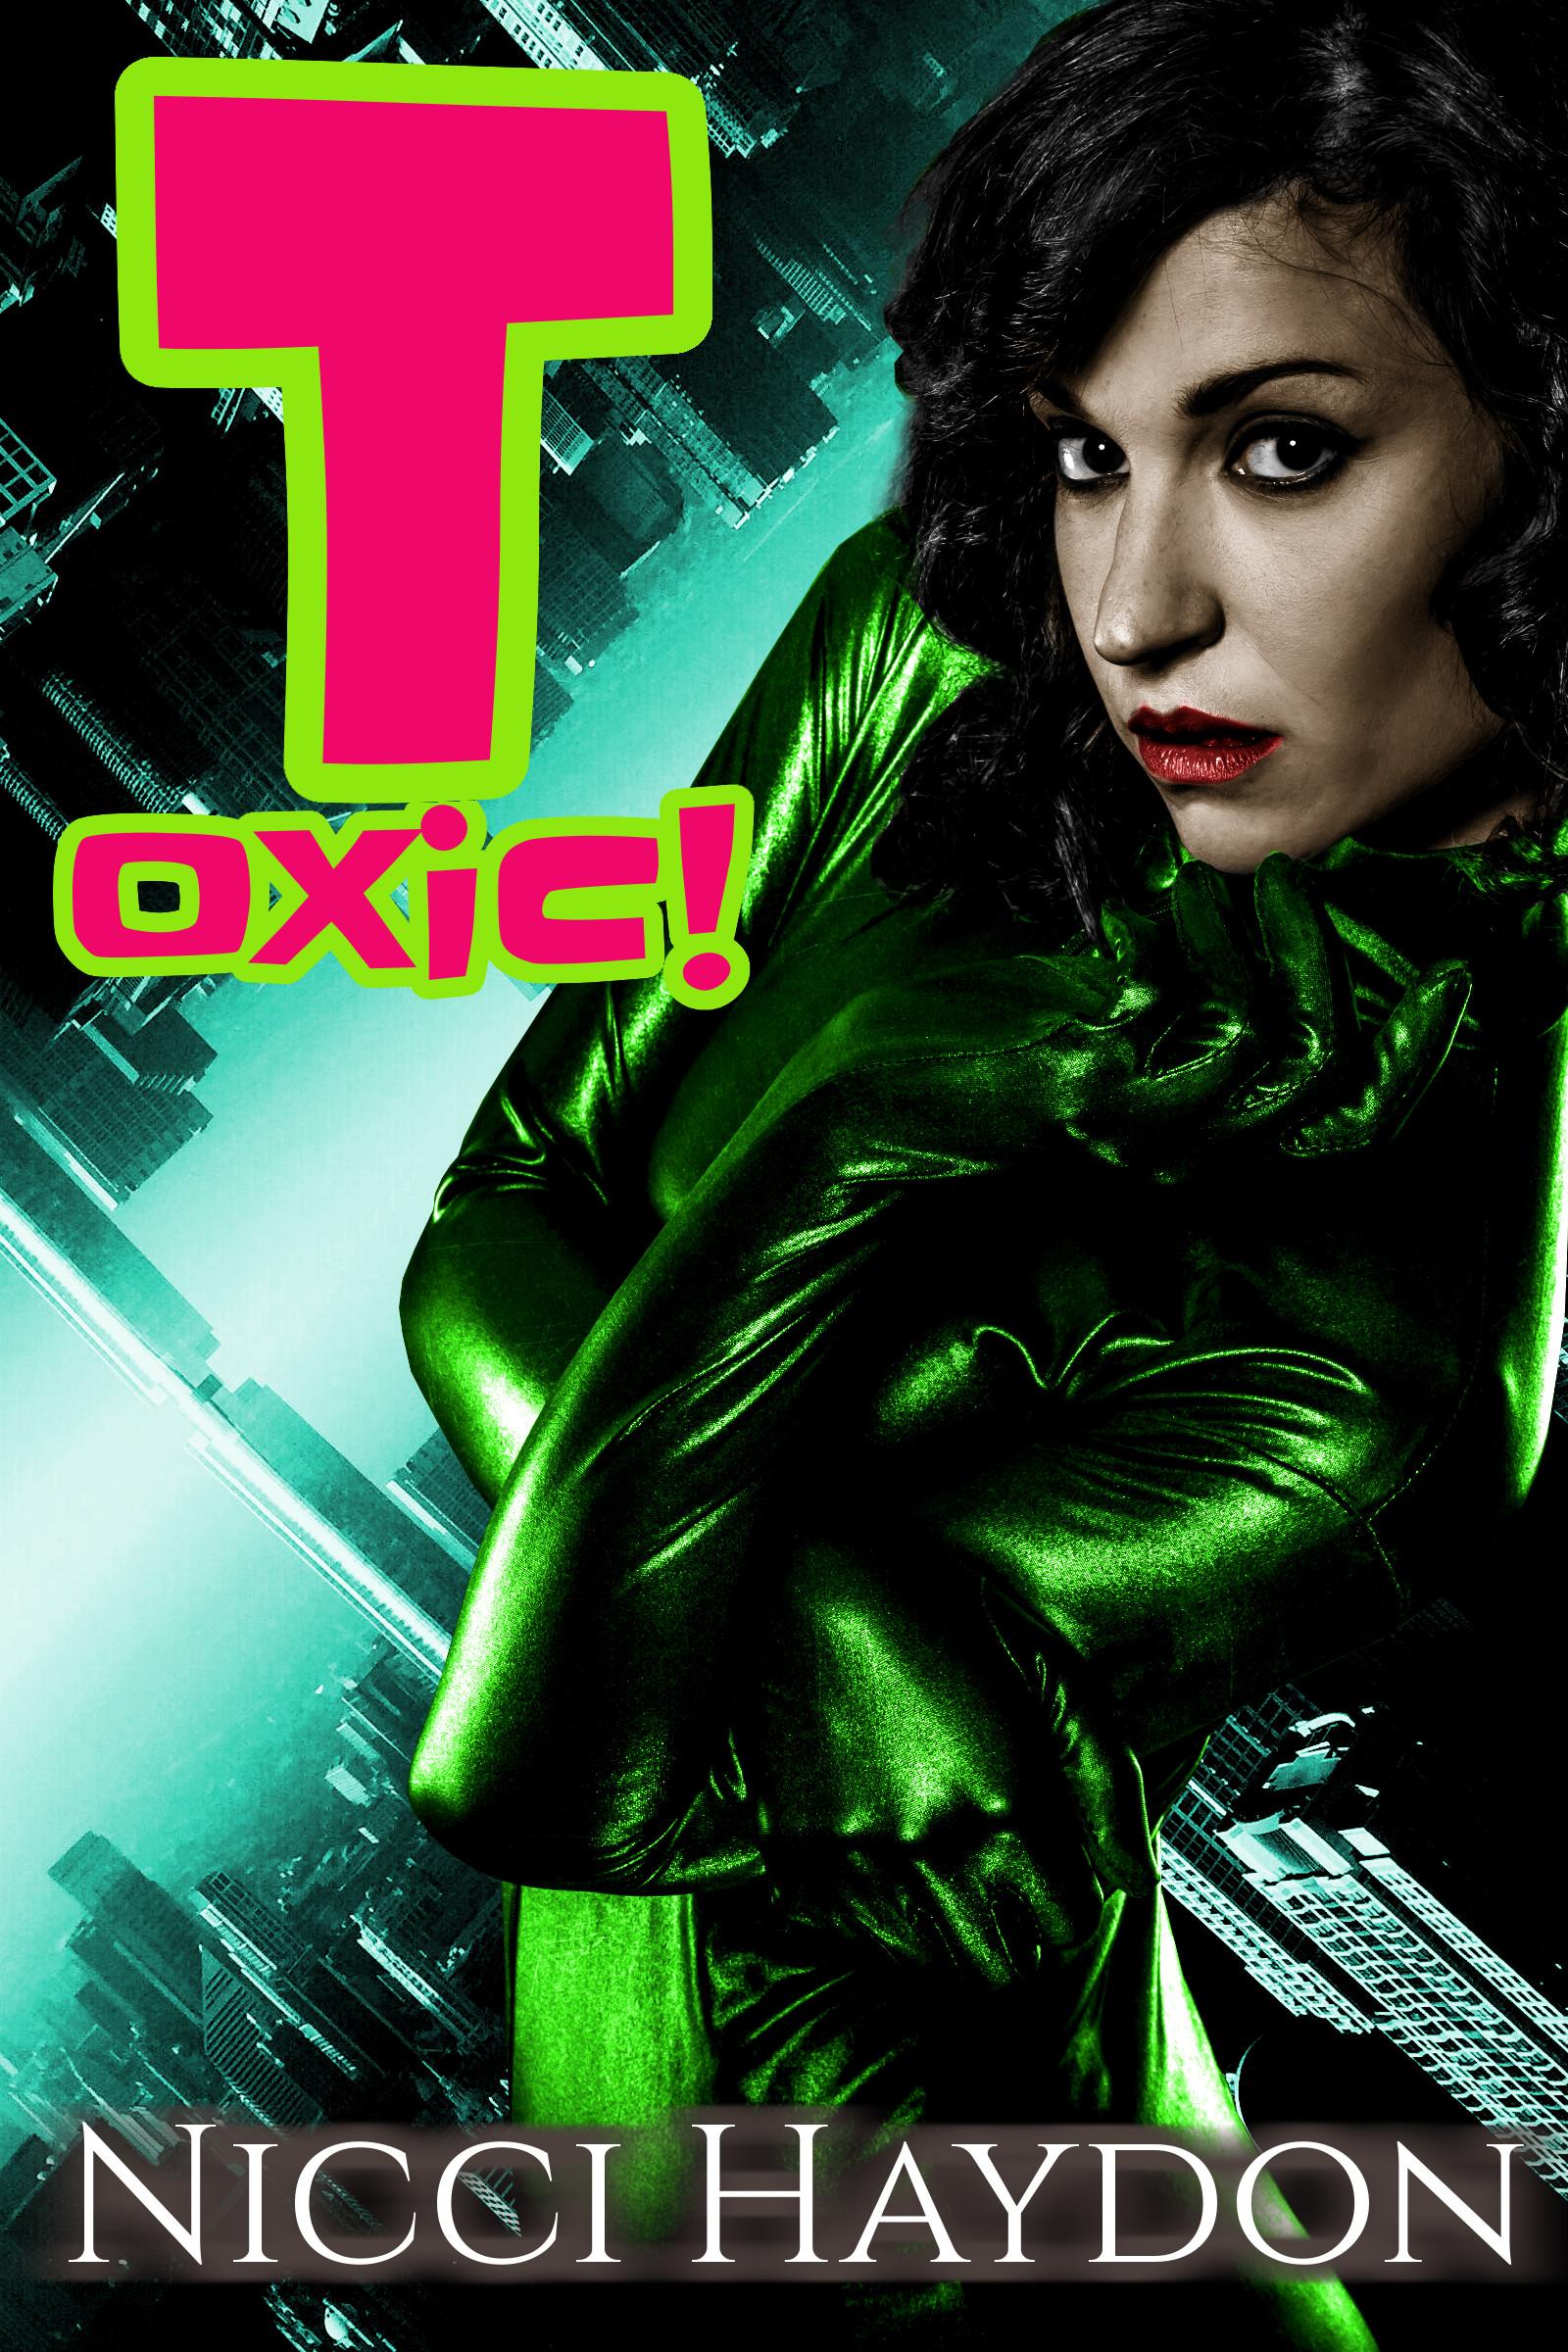 Toxic! (M/F Superheroes)